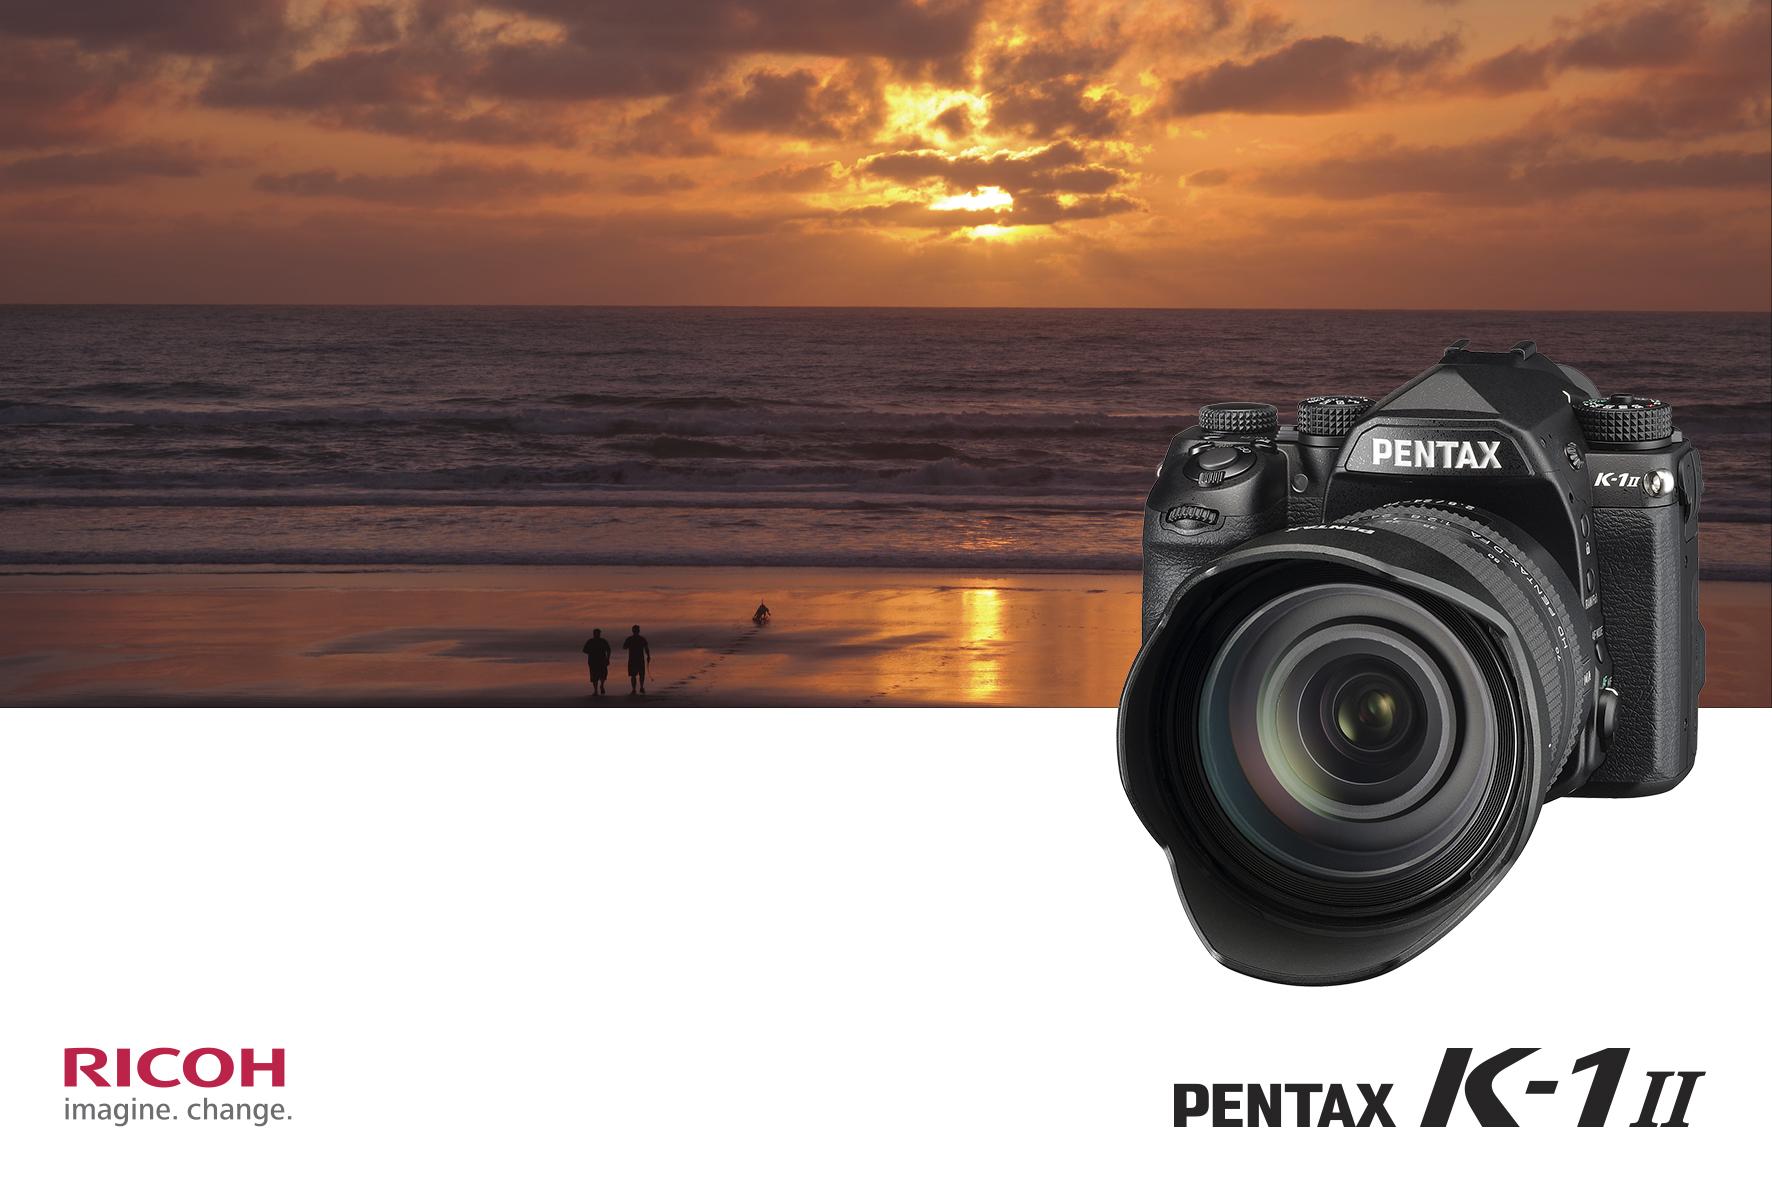 Pentax K-1 Mark II – Snabbare, smartare, känsligare